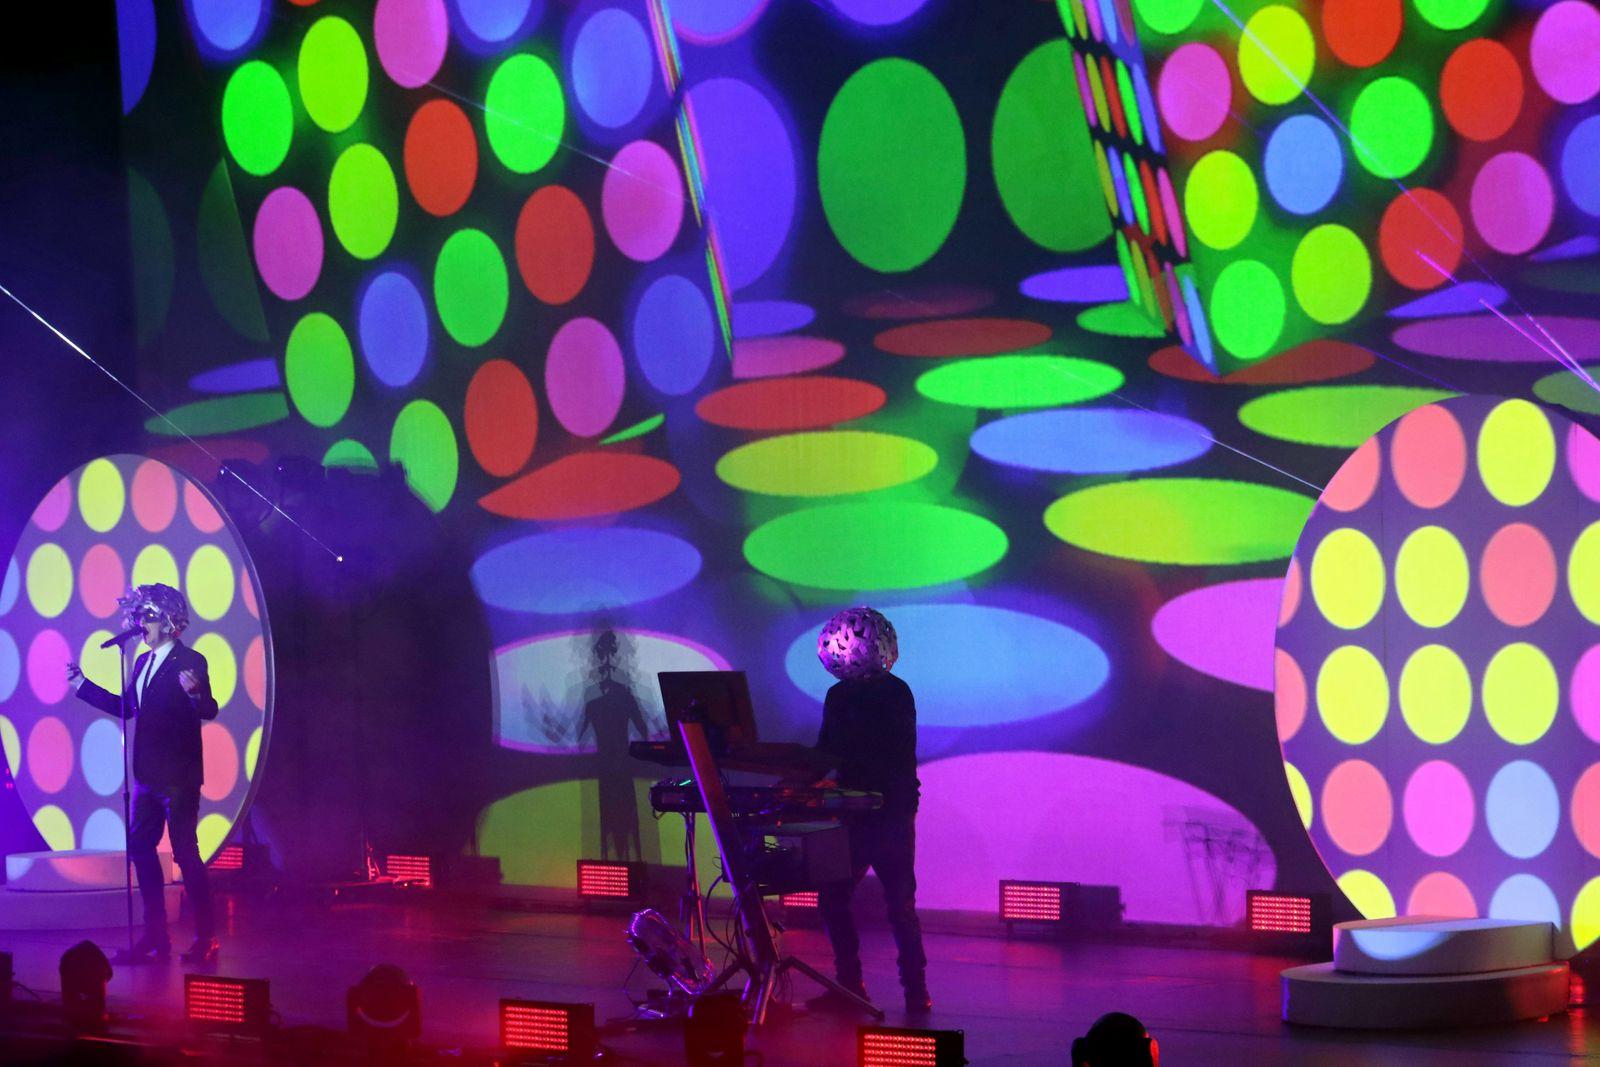 July 18 2018 Marbella Malaga Spain The British duo known as the Pet Shop Boys Neil Tennan a